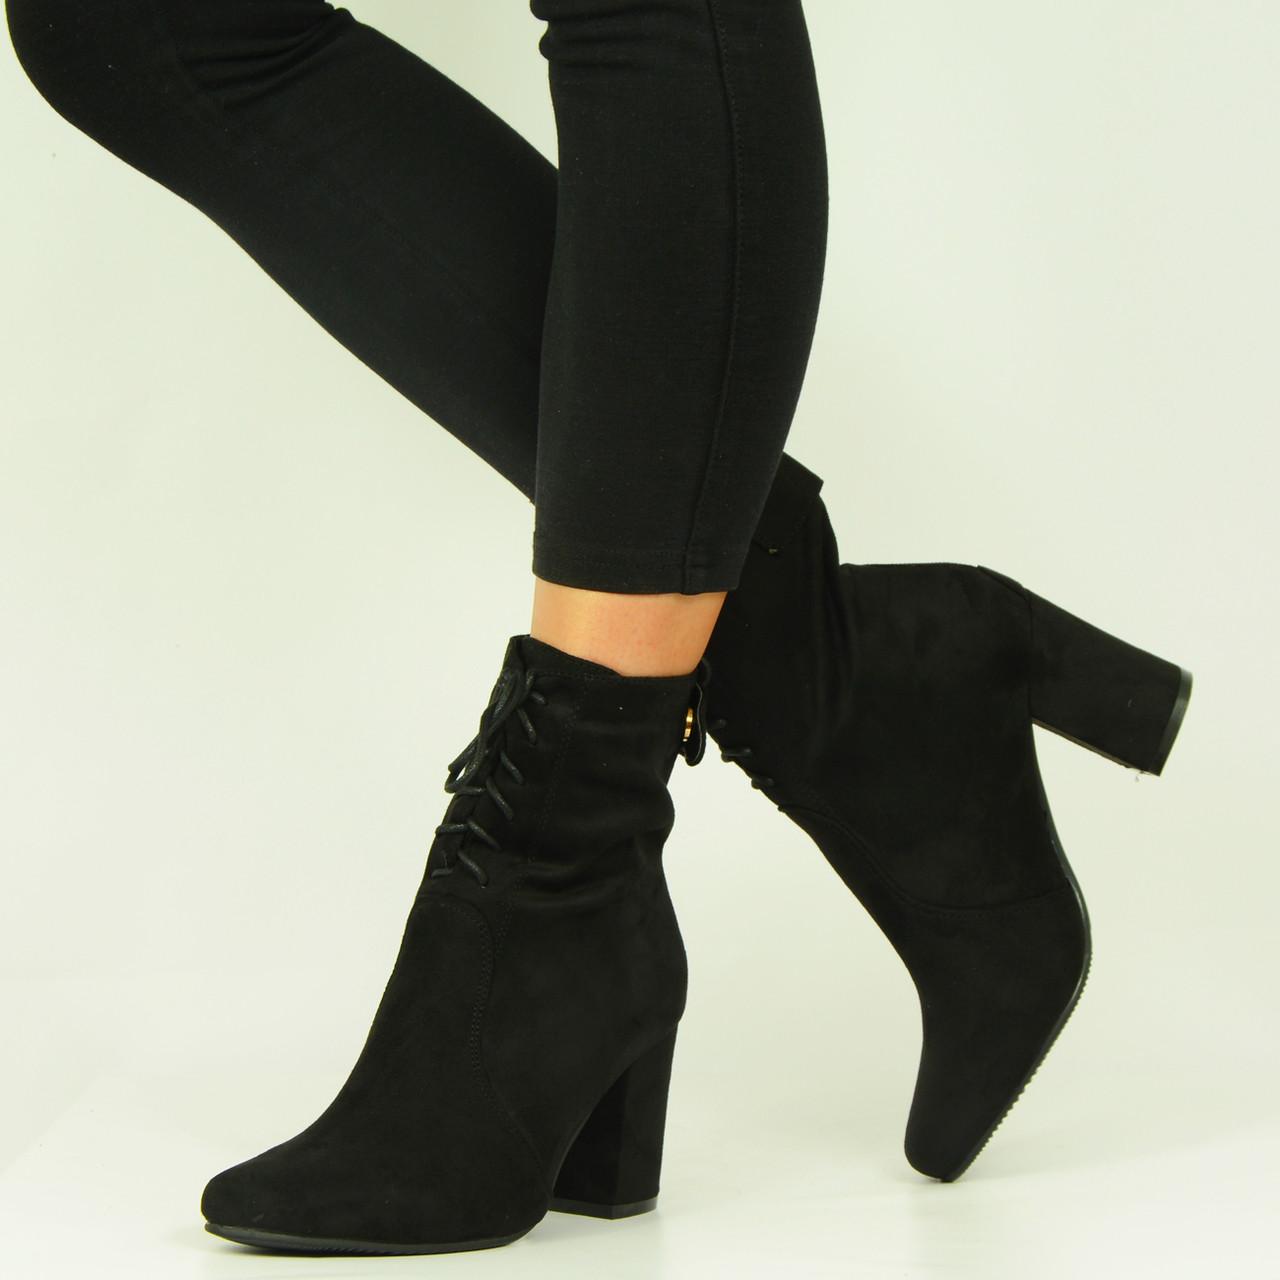 6cc31c84c0b New Womens Ladies Black Lace Up Ankle Boots - £15